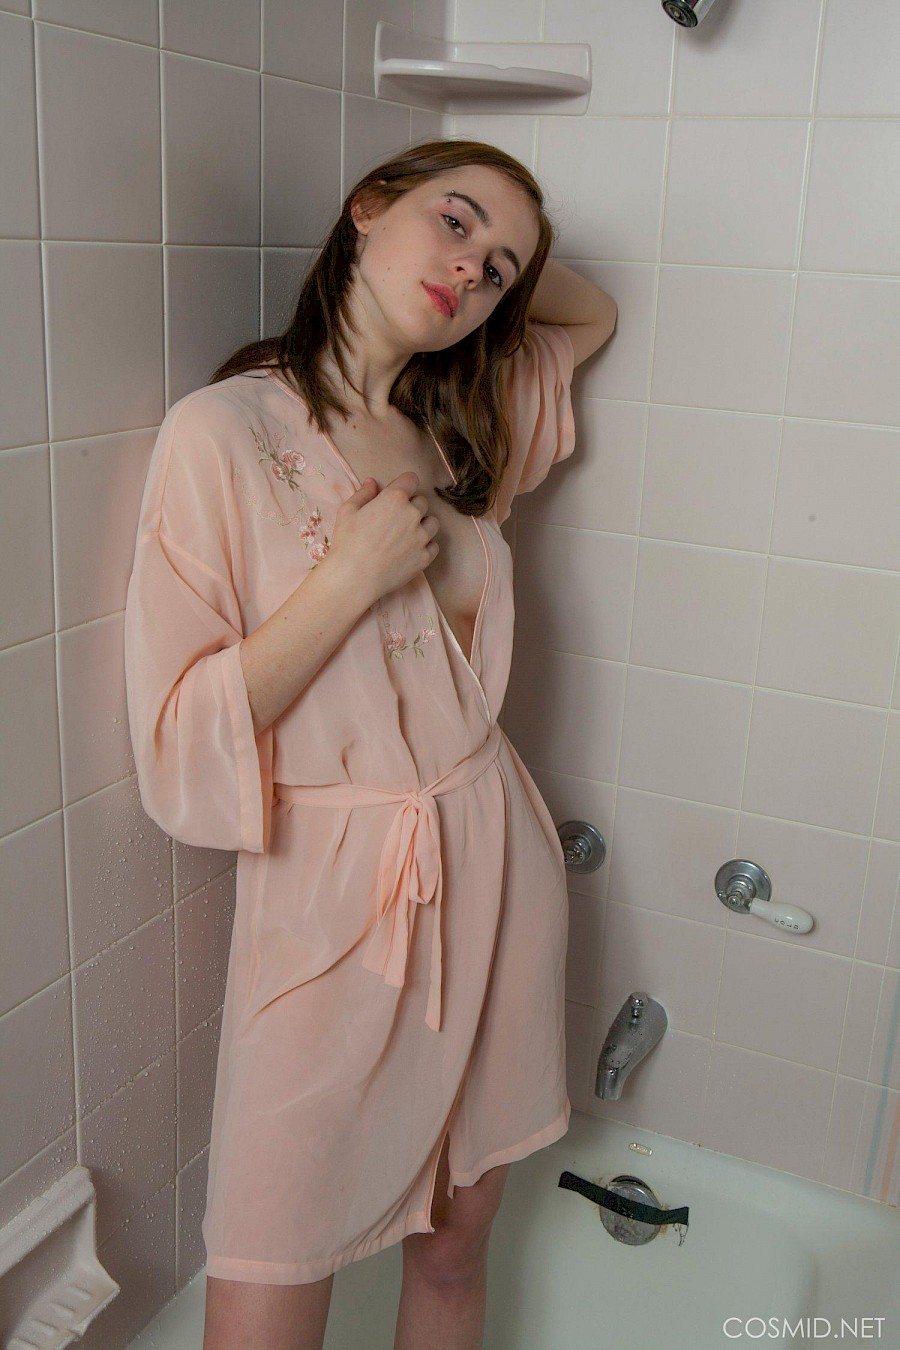 Taking shower sexy busty brunette a